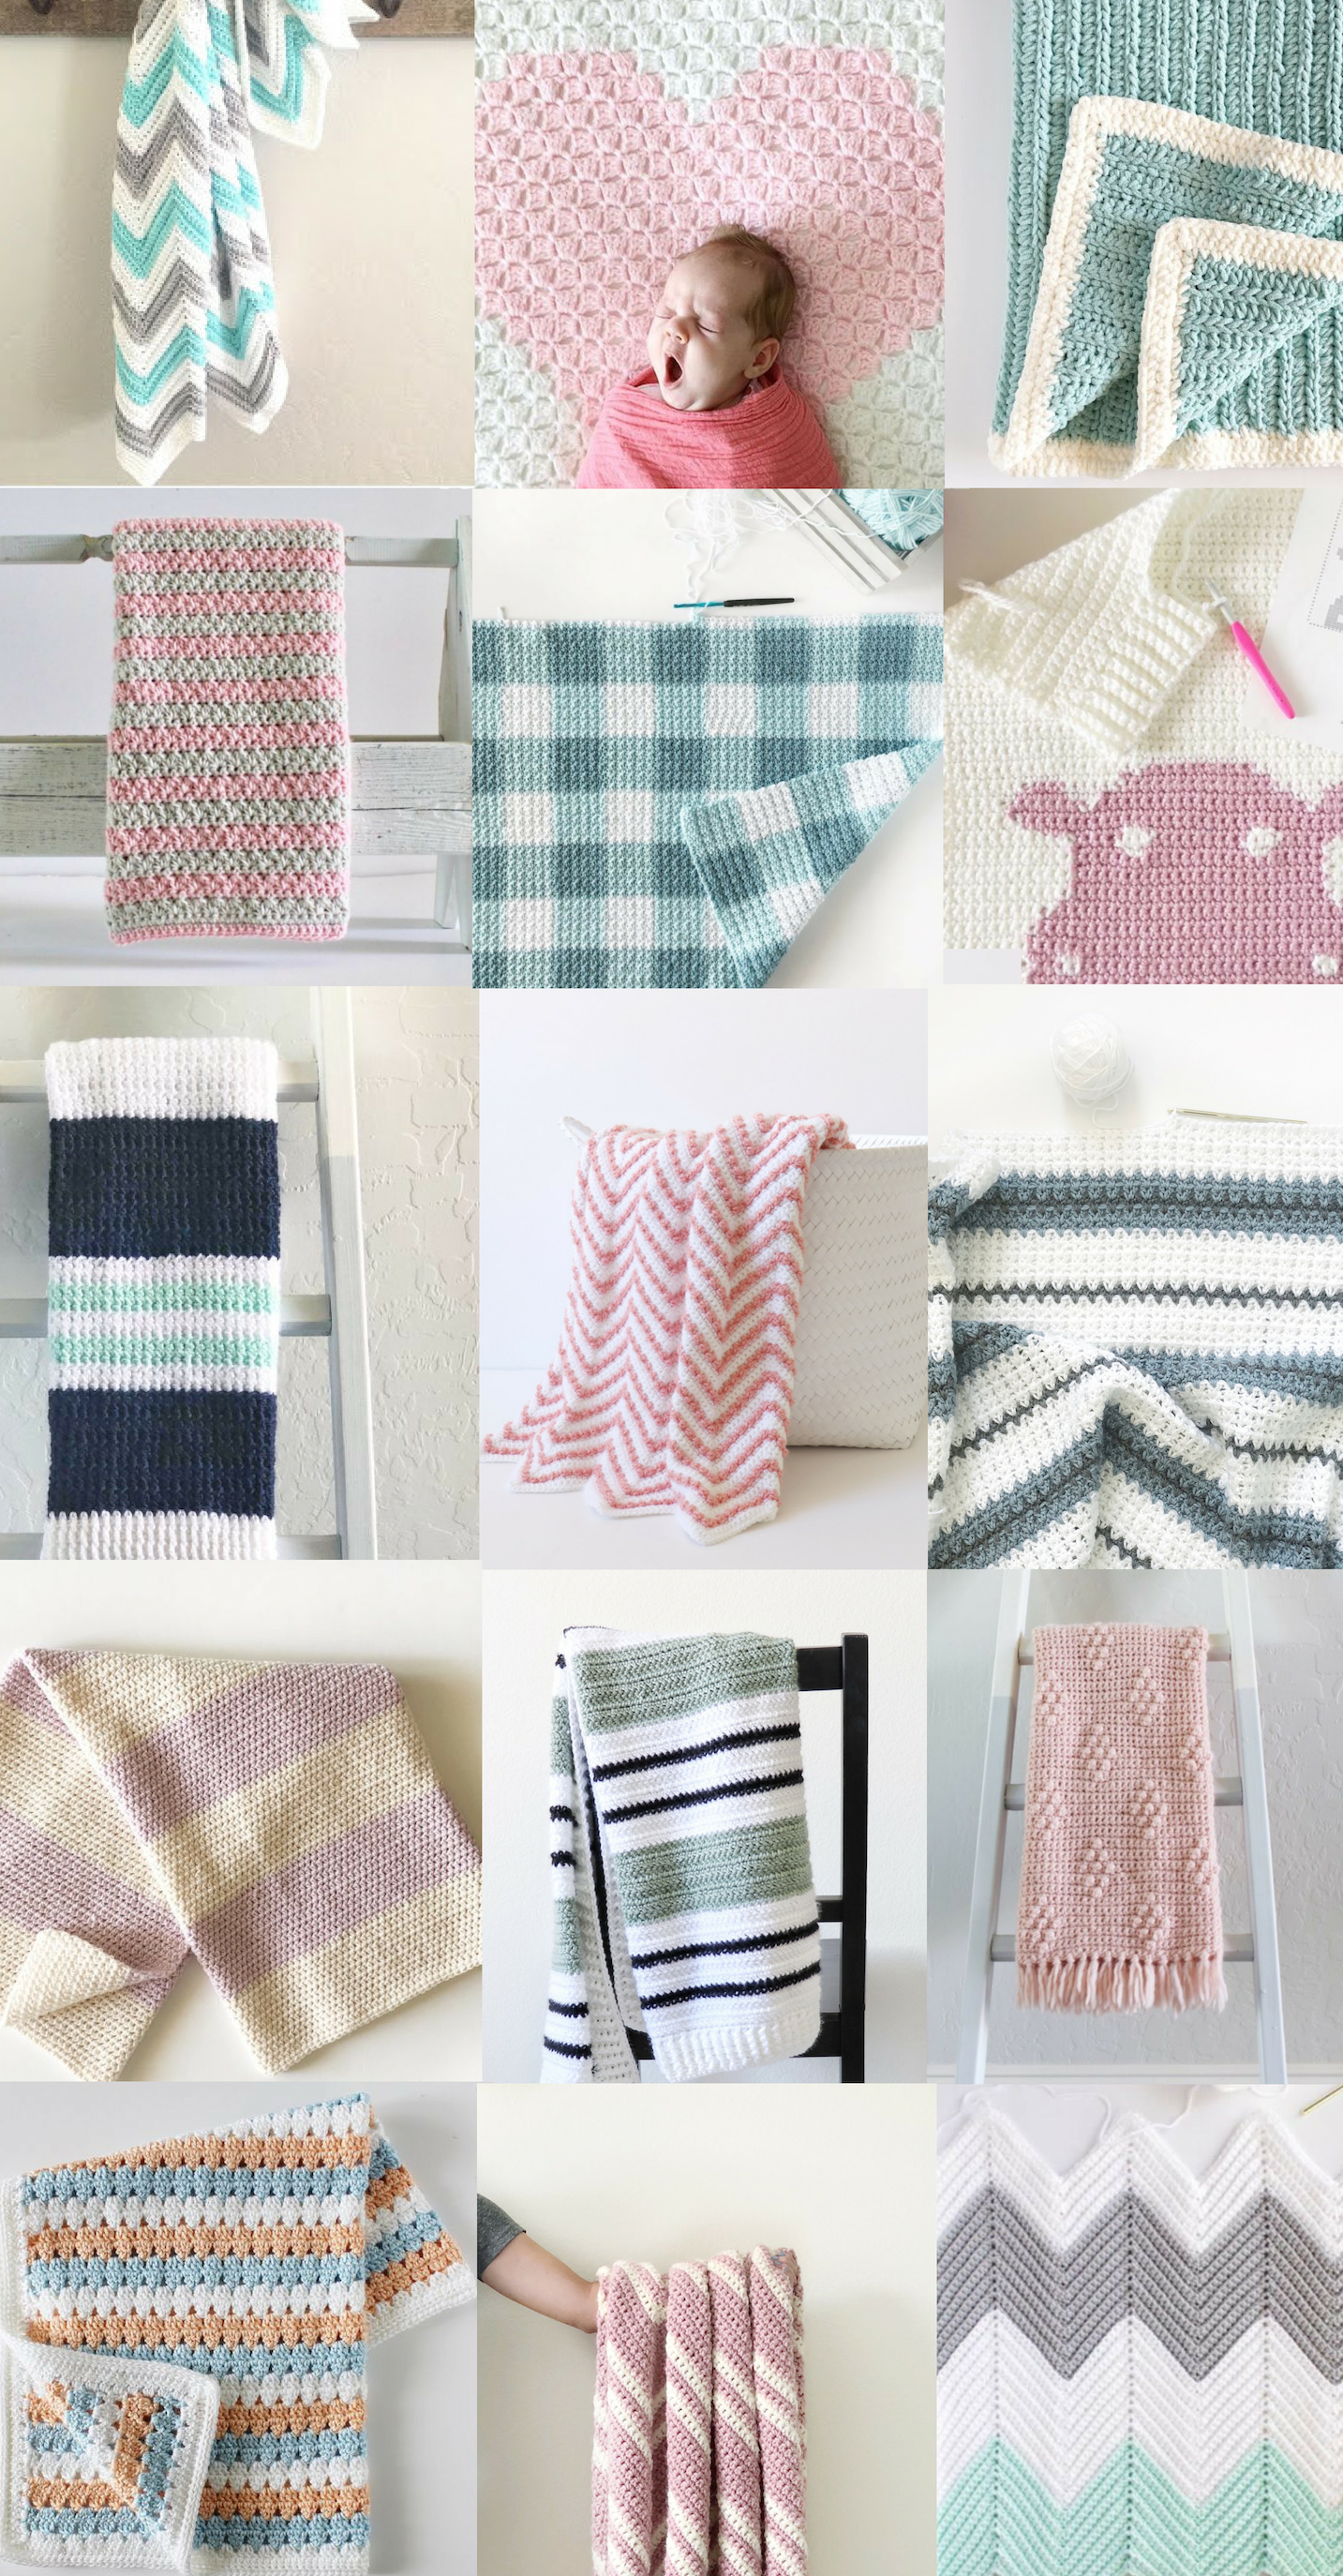 75 Free Crochet Blanket Patterns from Daisy Farm Crafts | Crochet ...